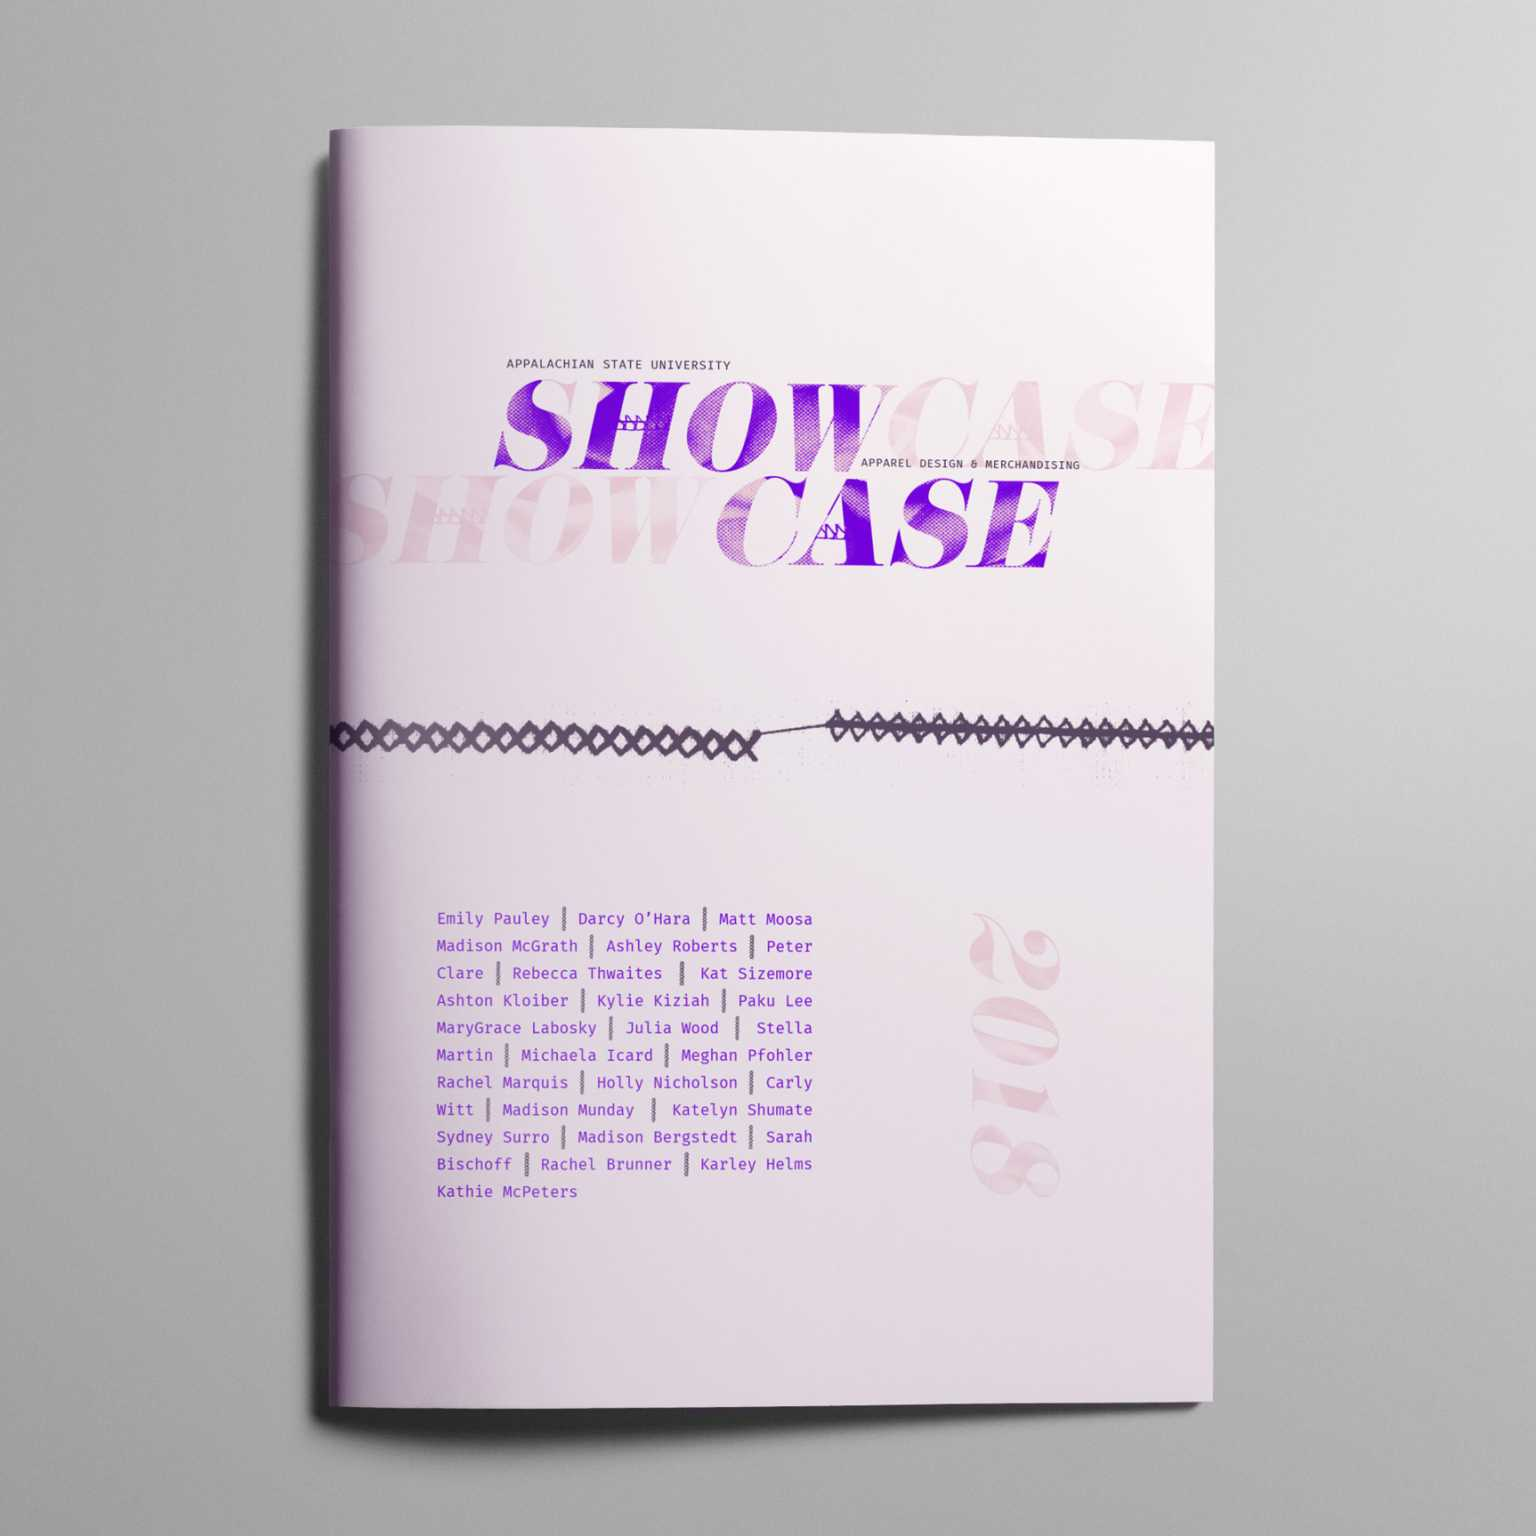 Program Cover for Showcase, the Apparel Design and Merchandising Program's annual fashion show